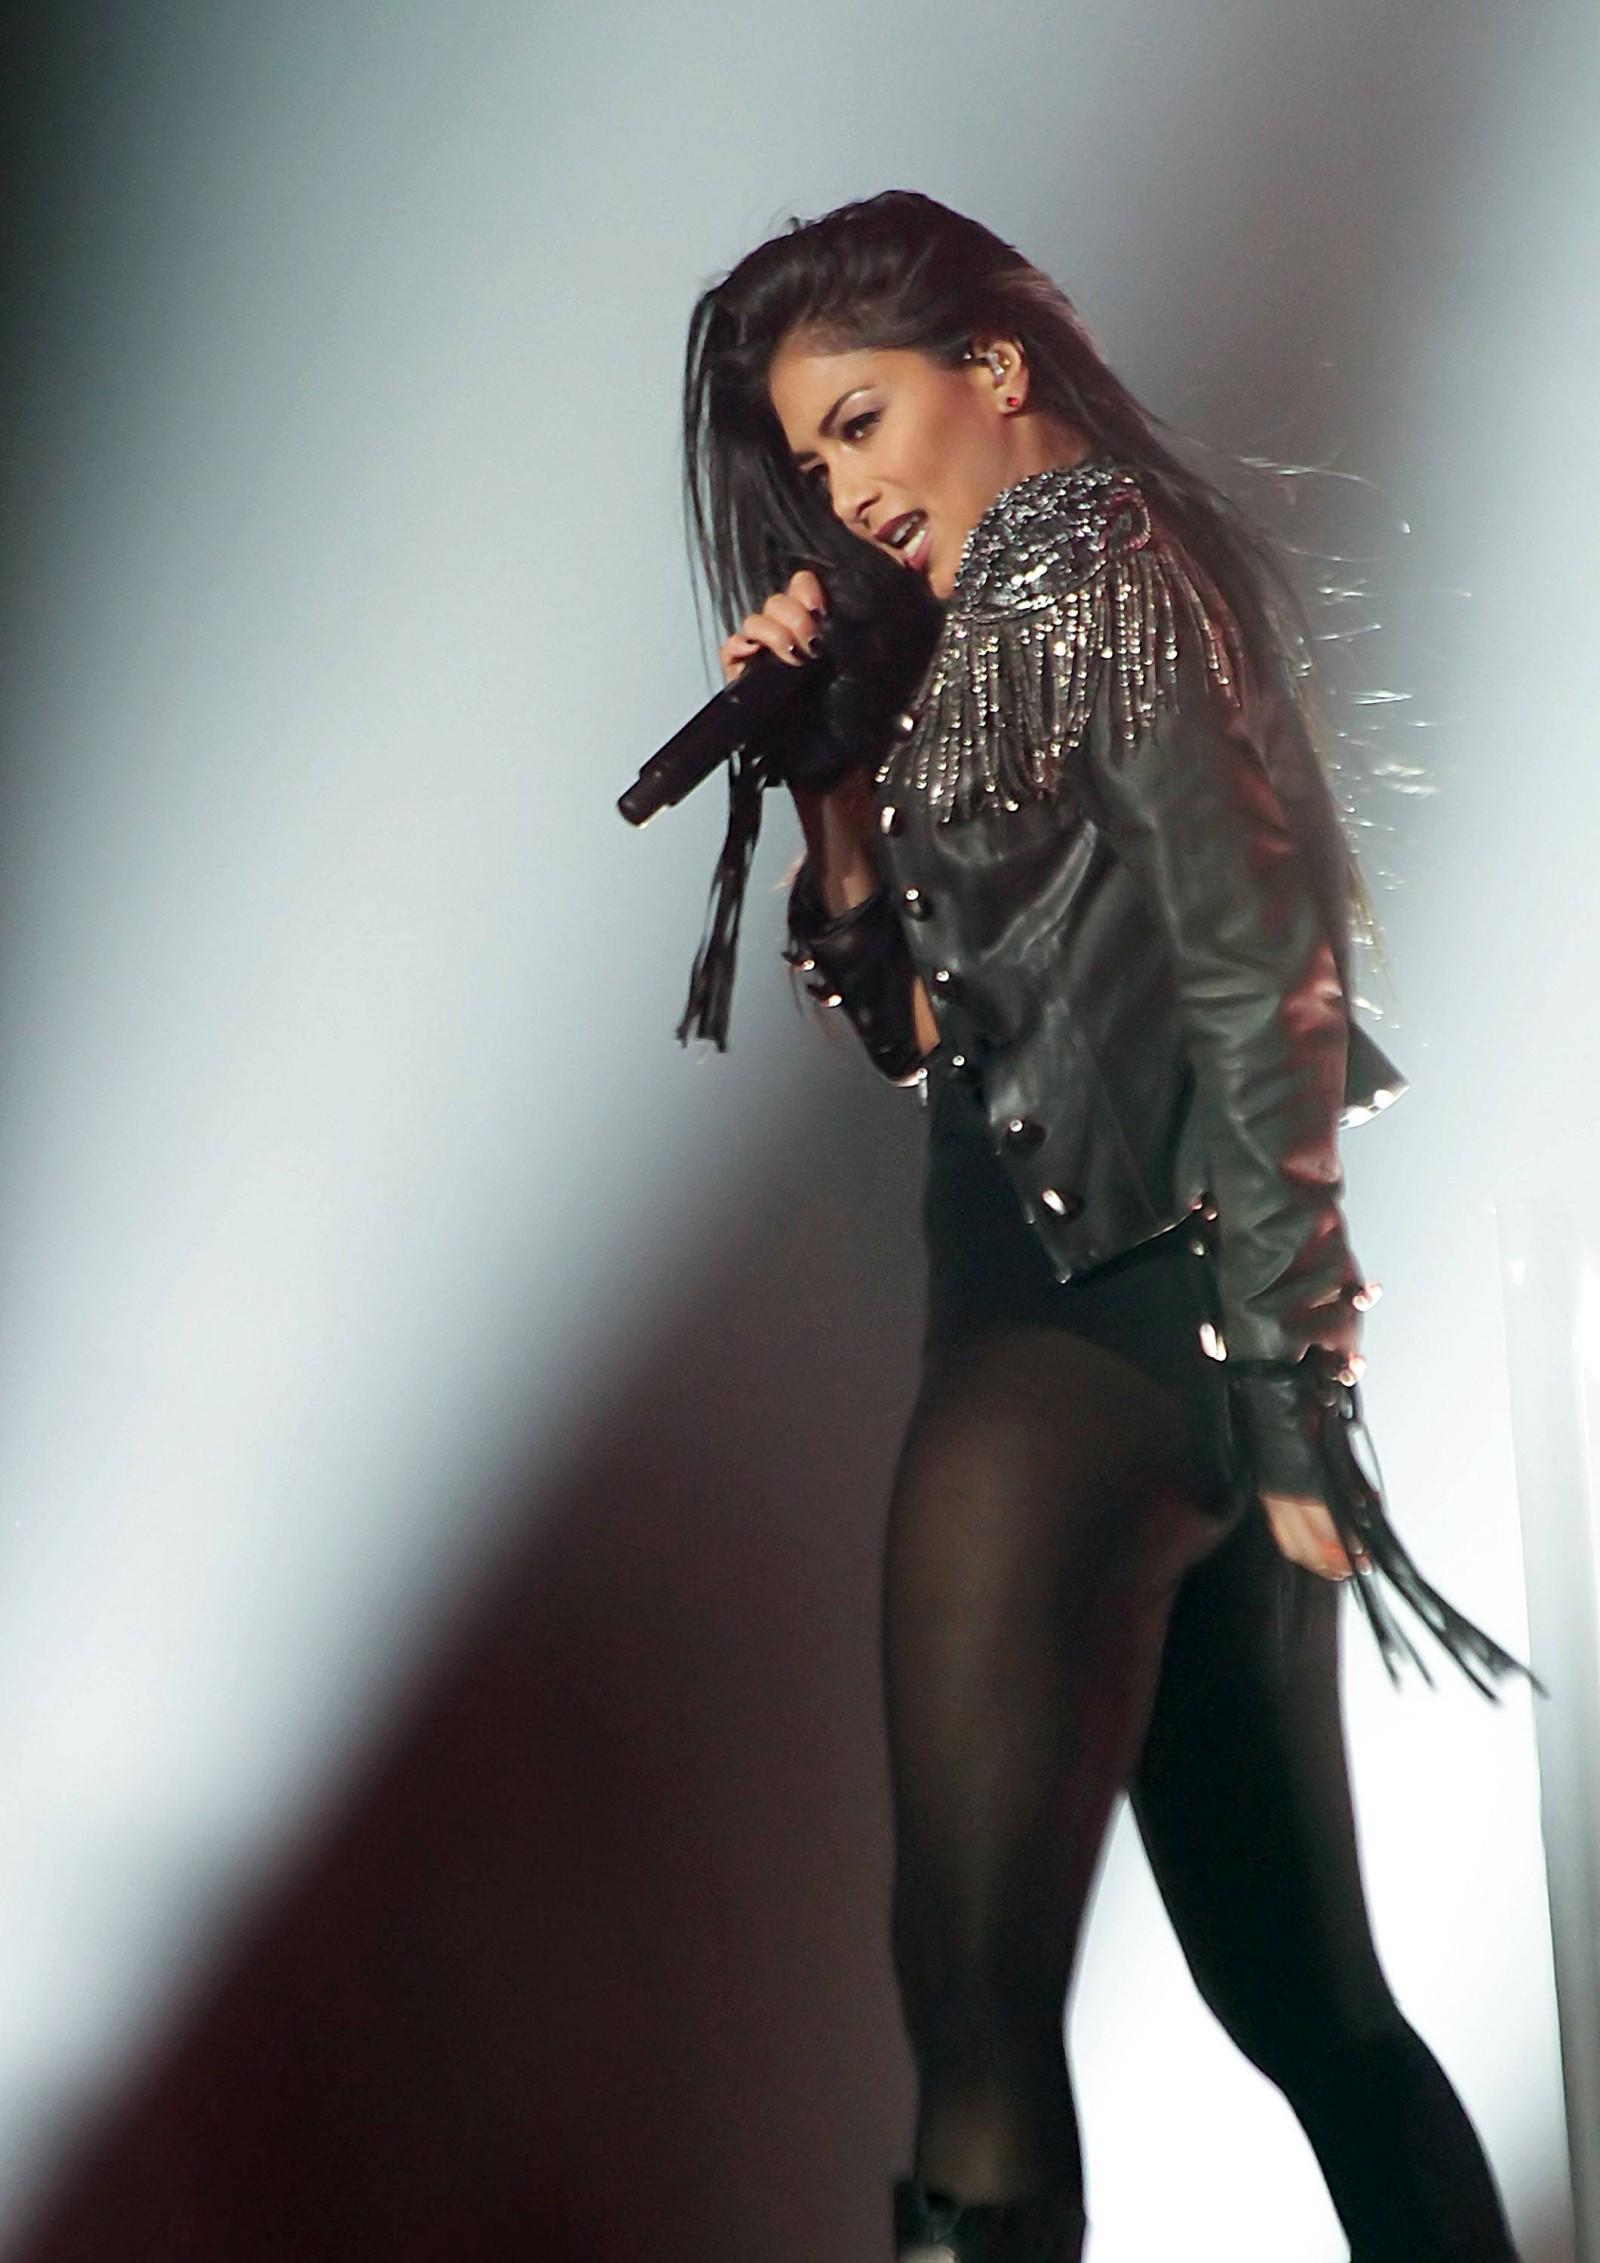 Nicole Scherzinger Performs Live in Manchester [22 February 2012]